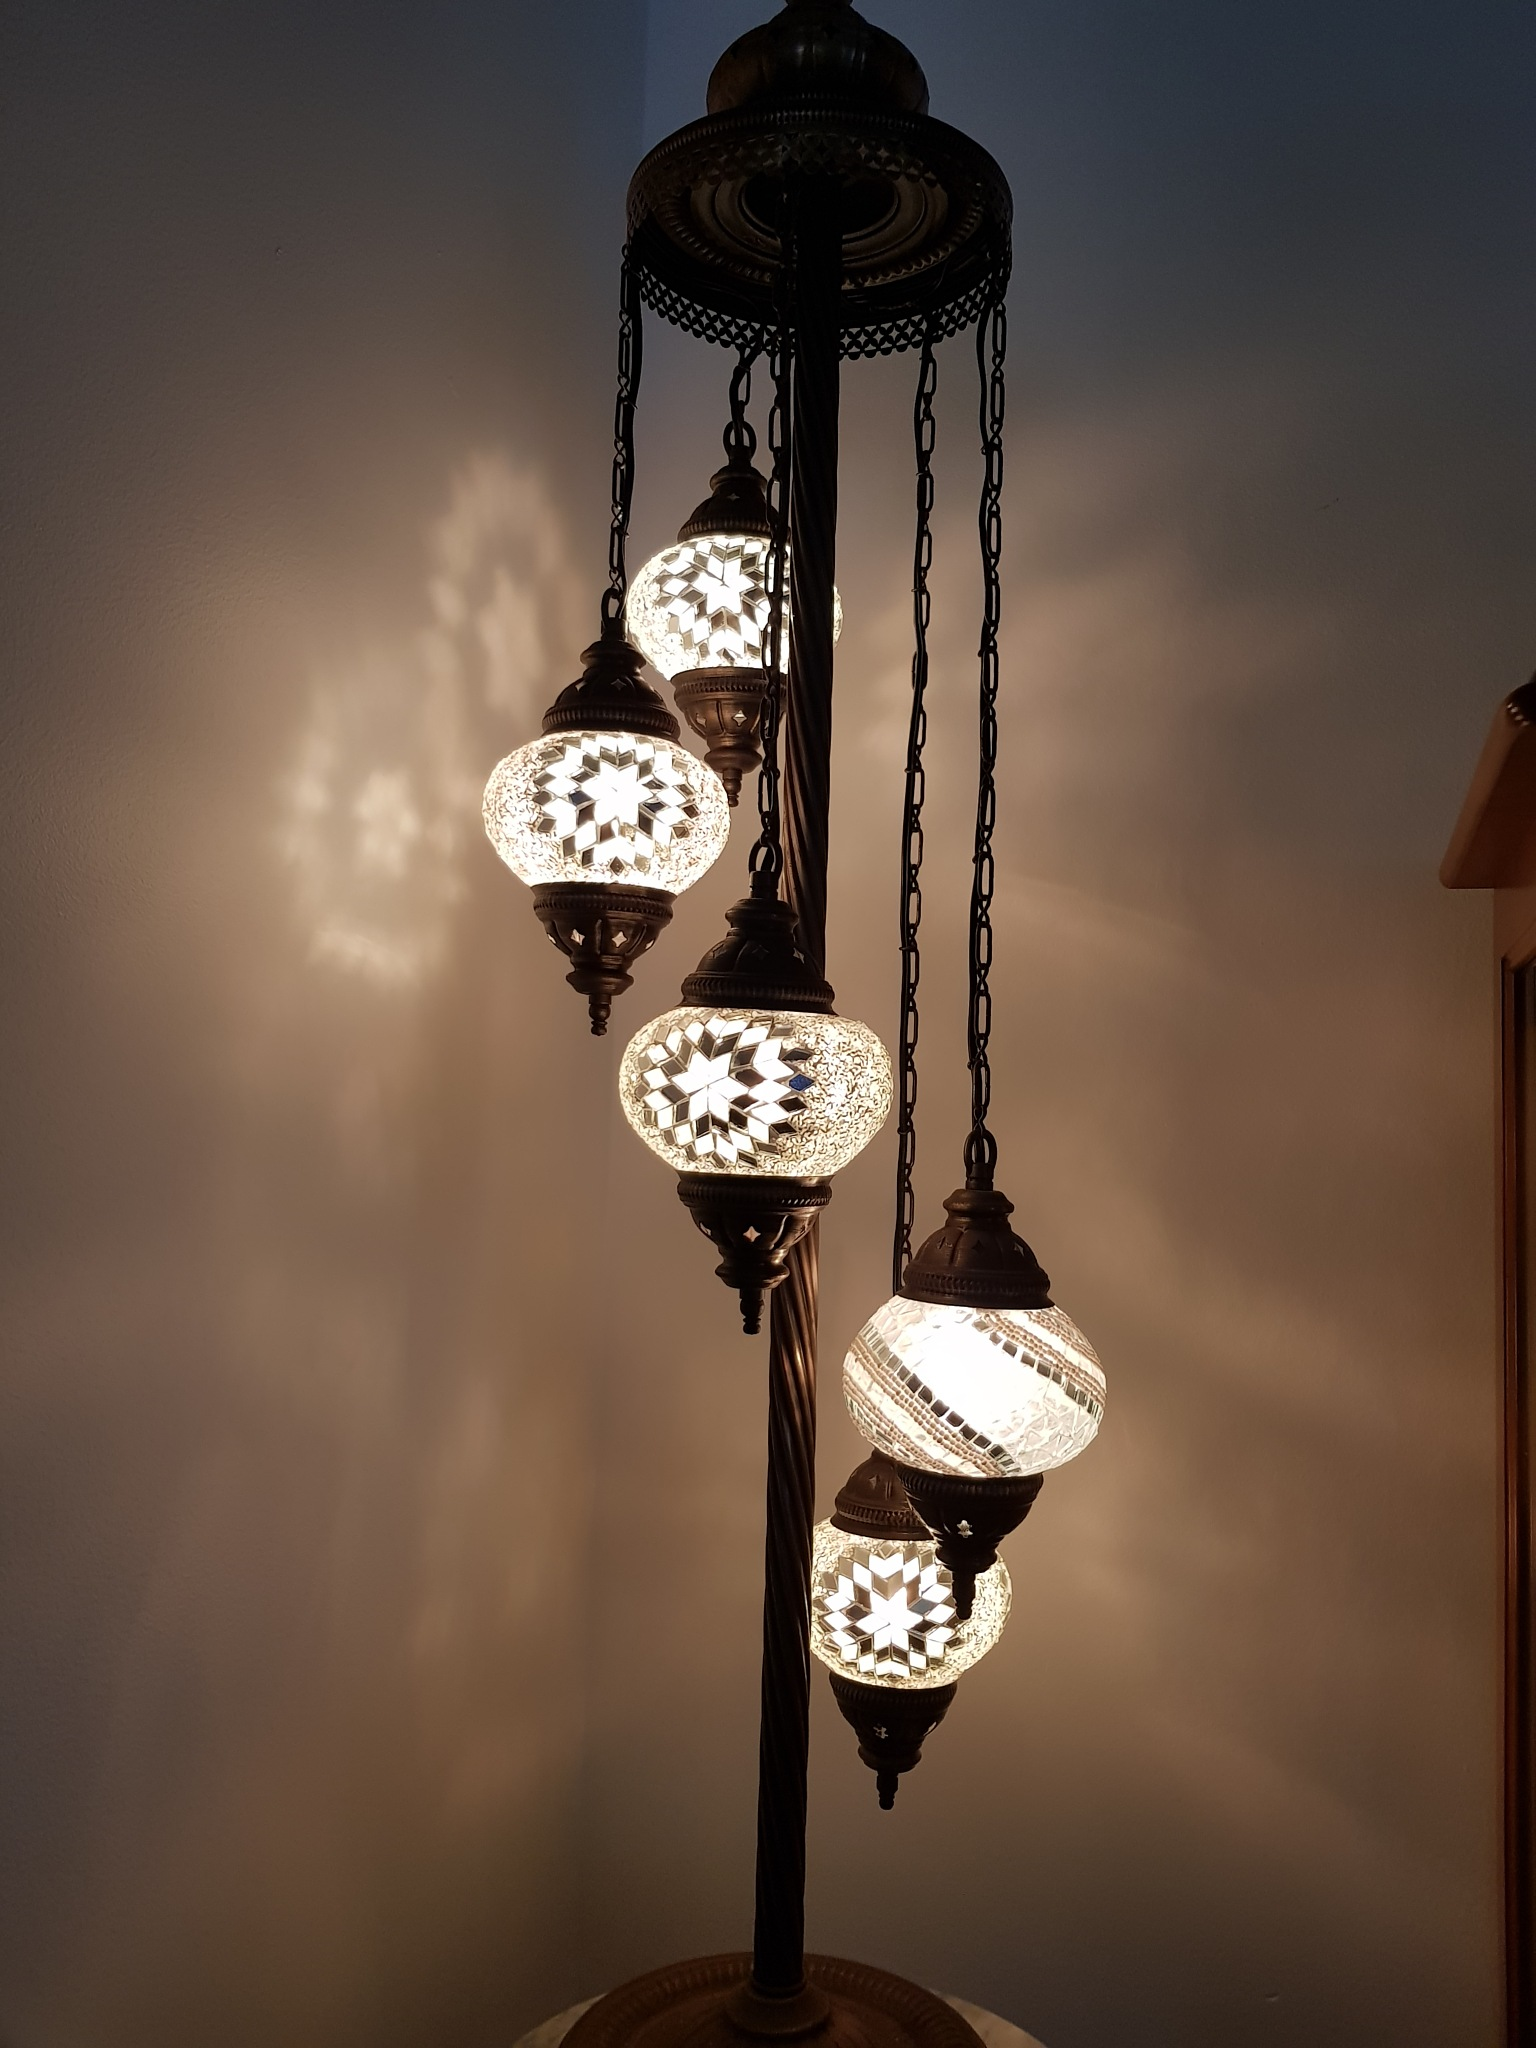 Turkish lamp by Michael De St Pern